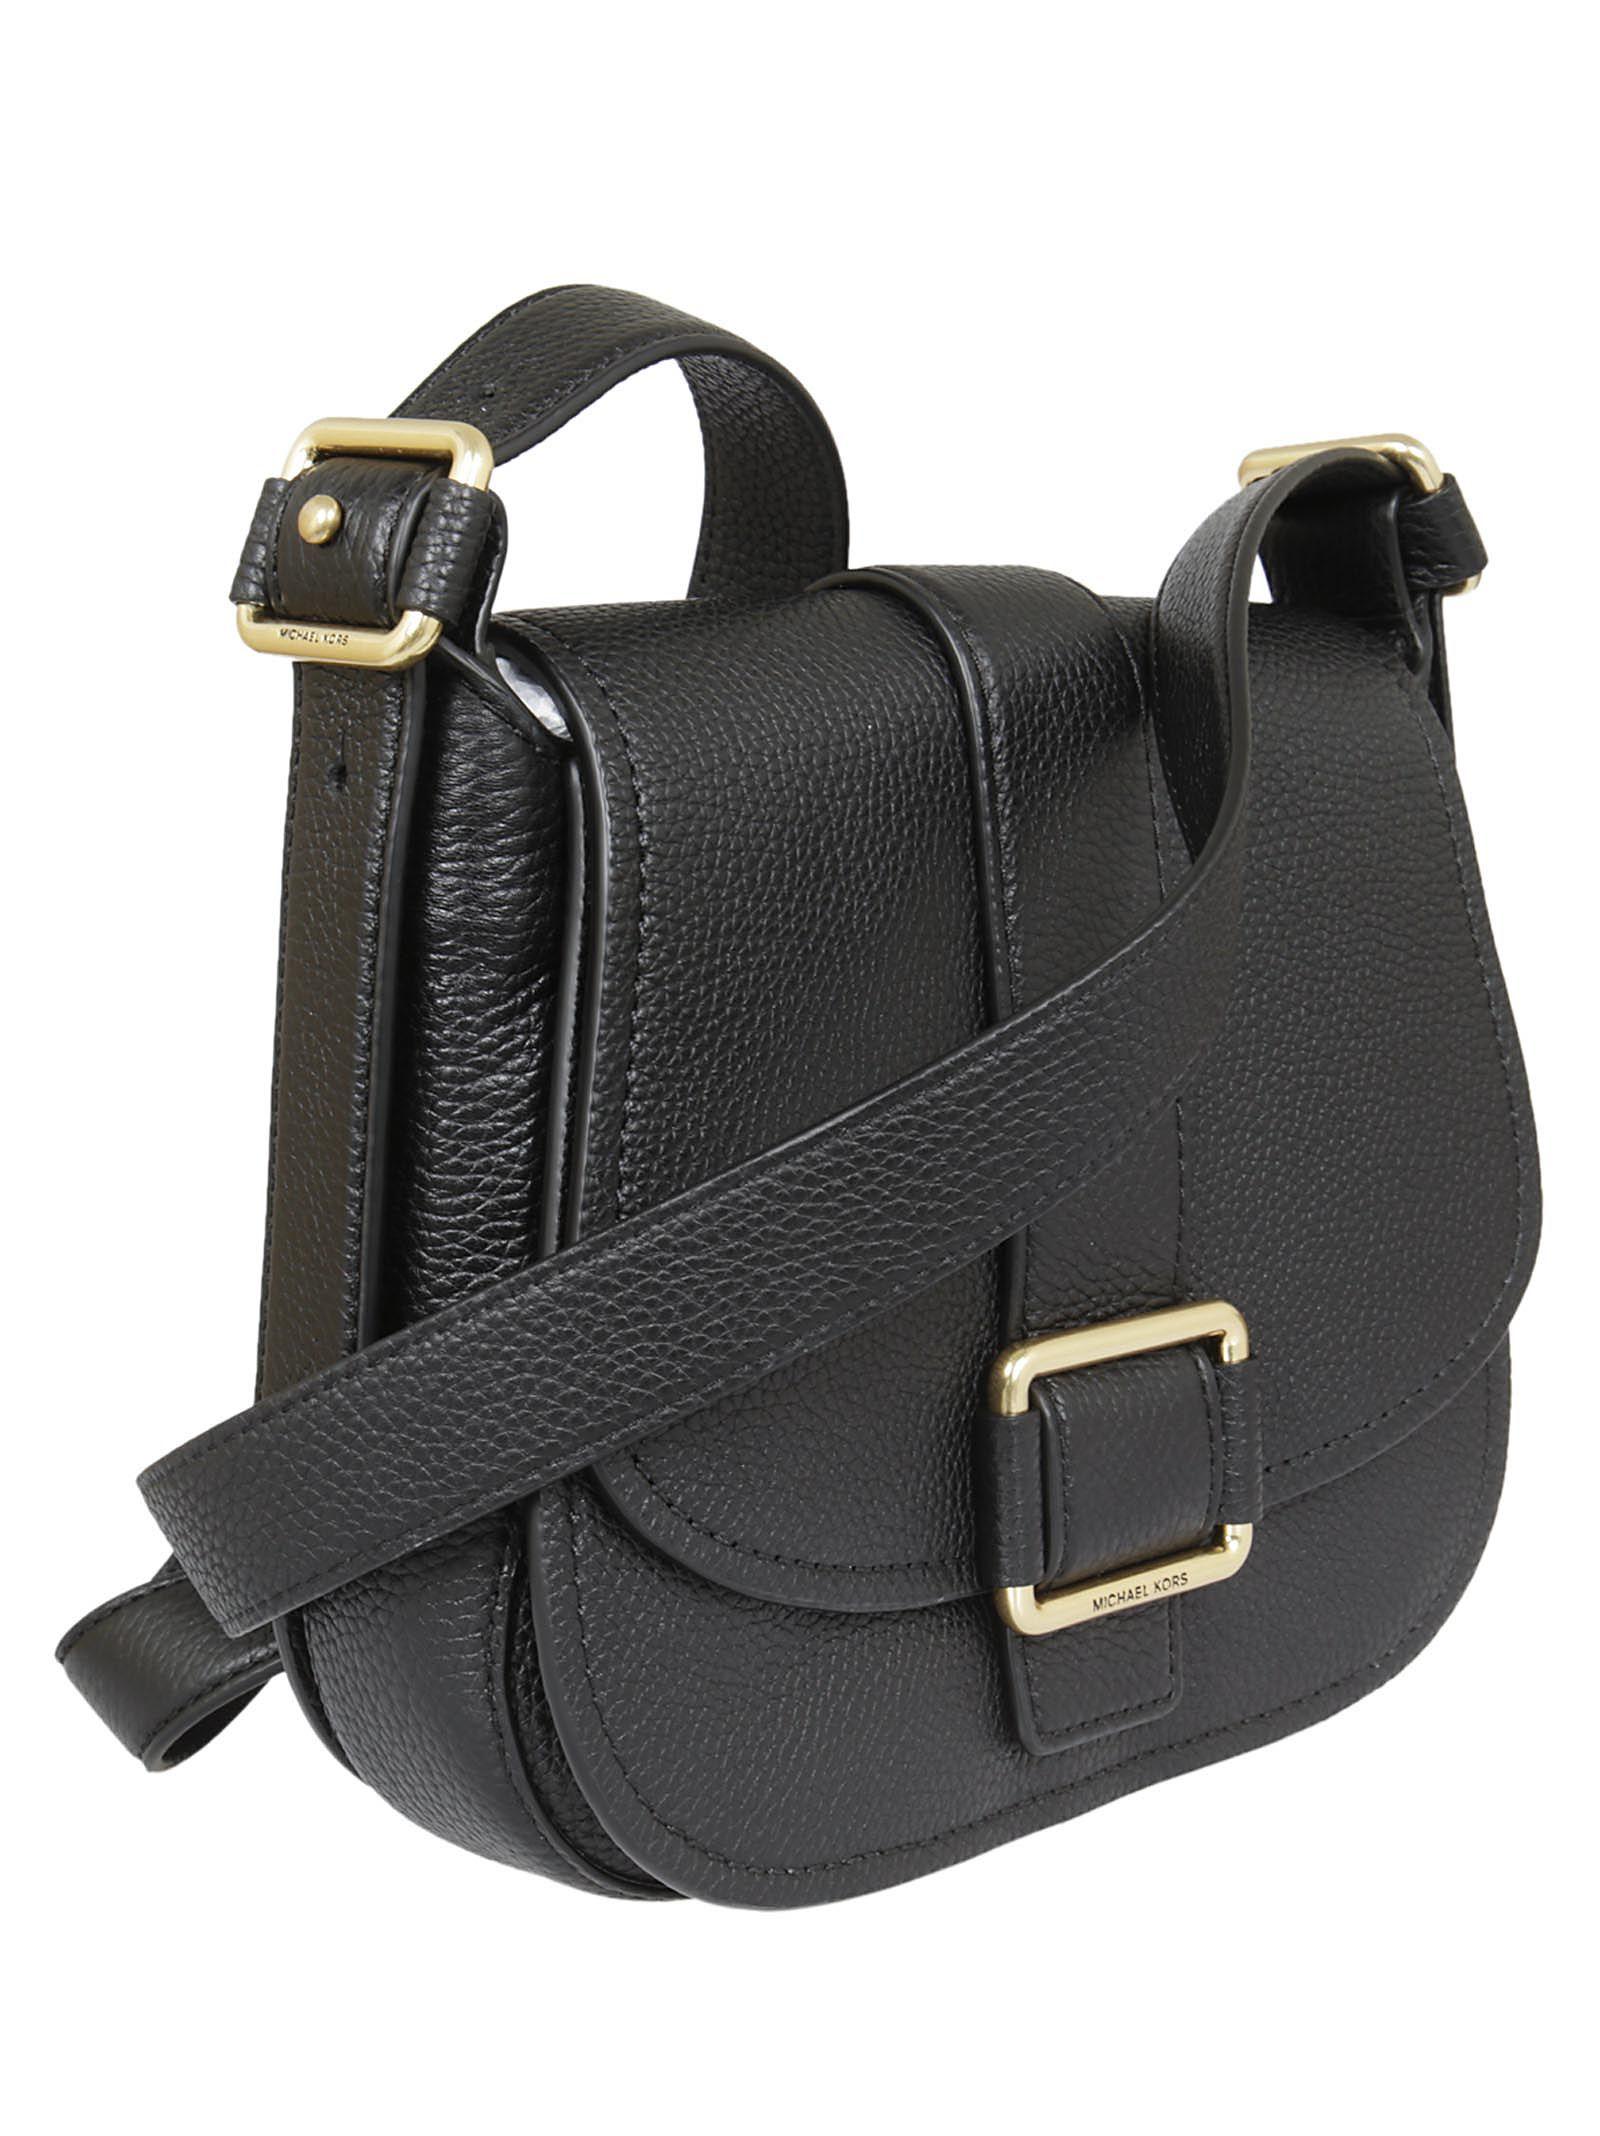 Michael Kors Maxine Shoulder Bag